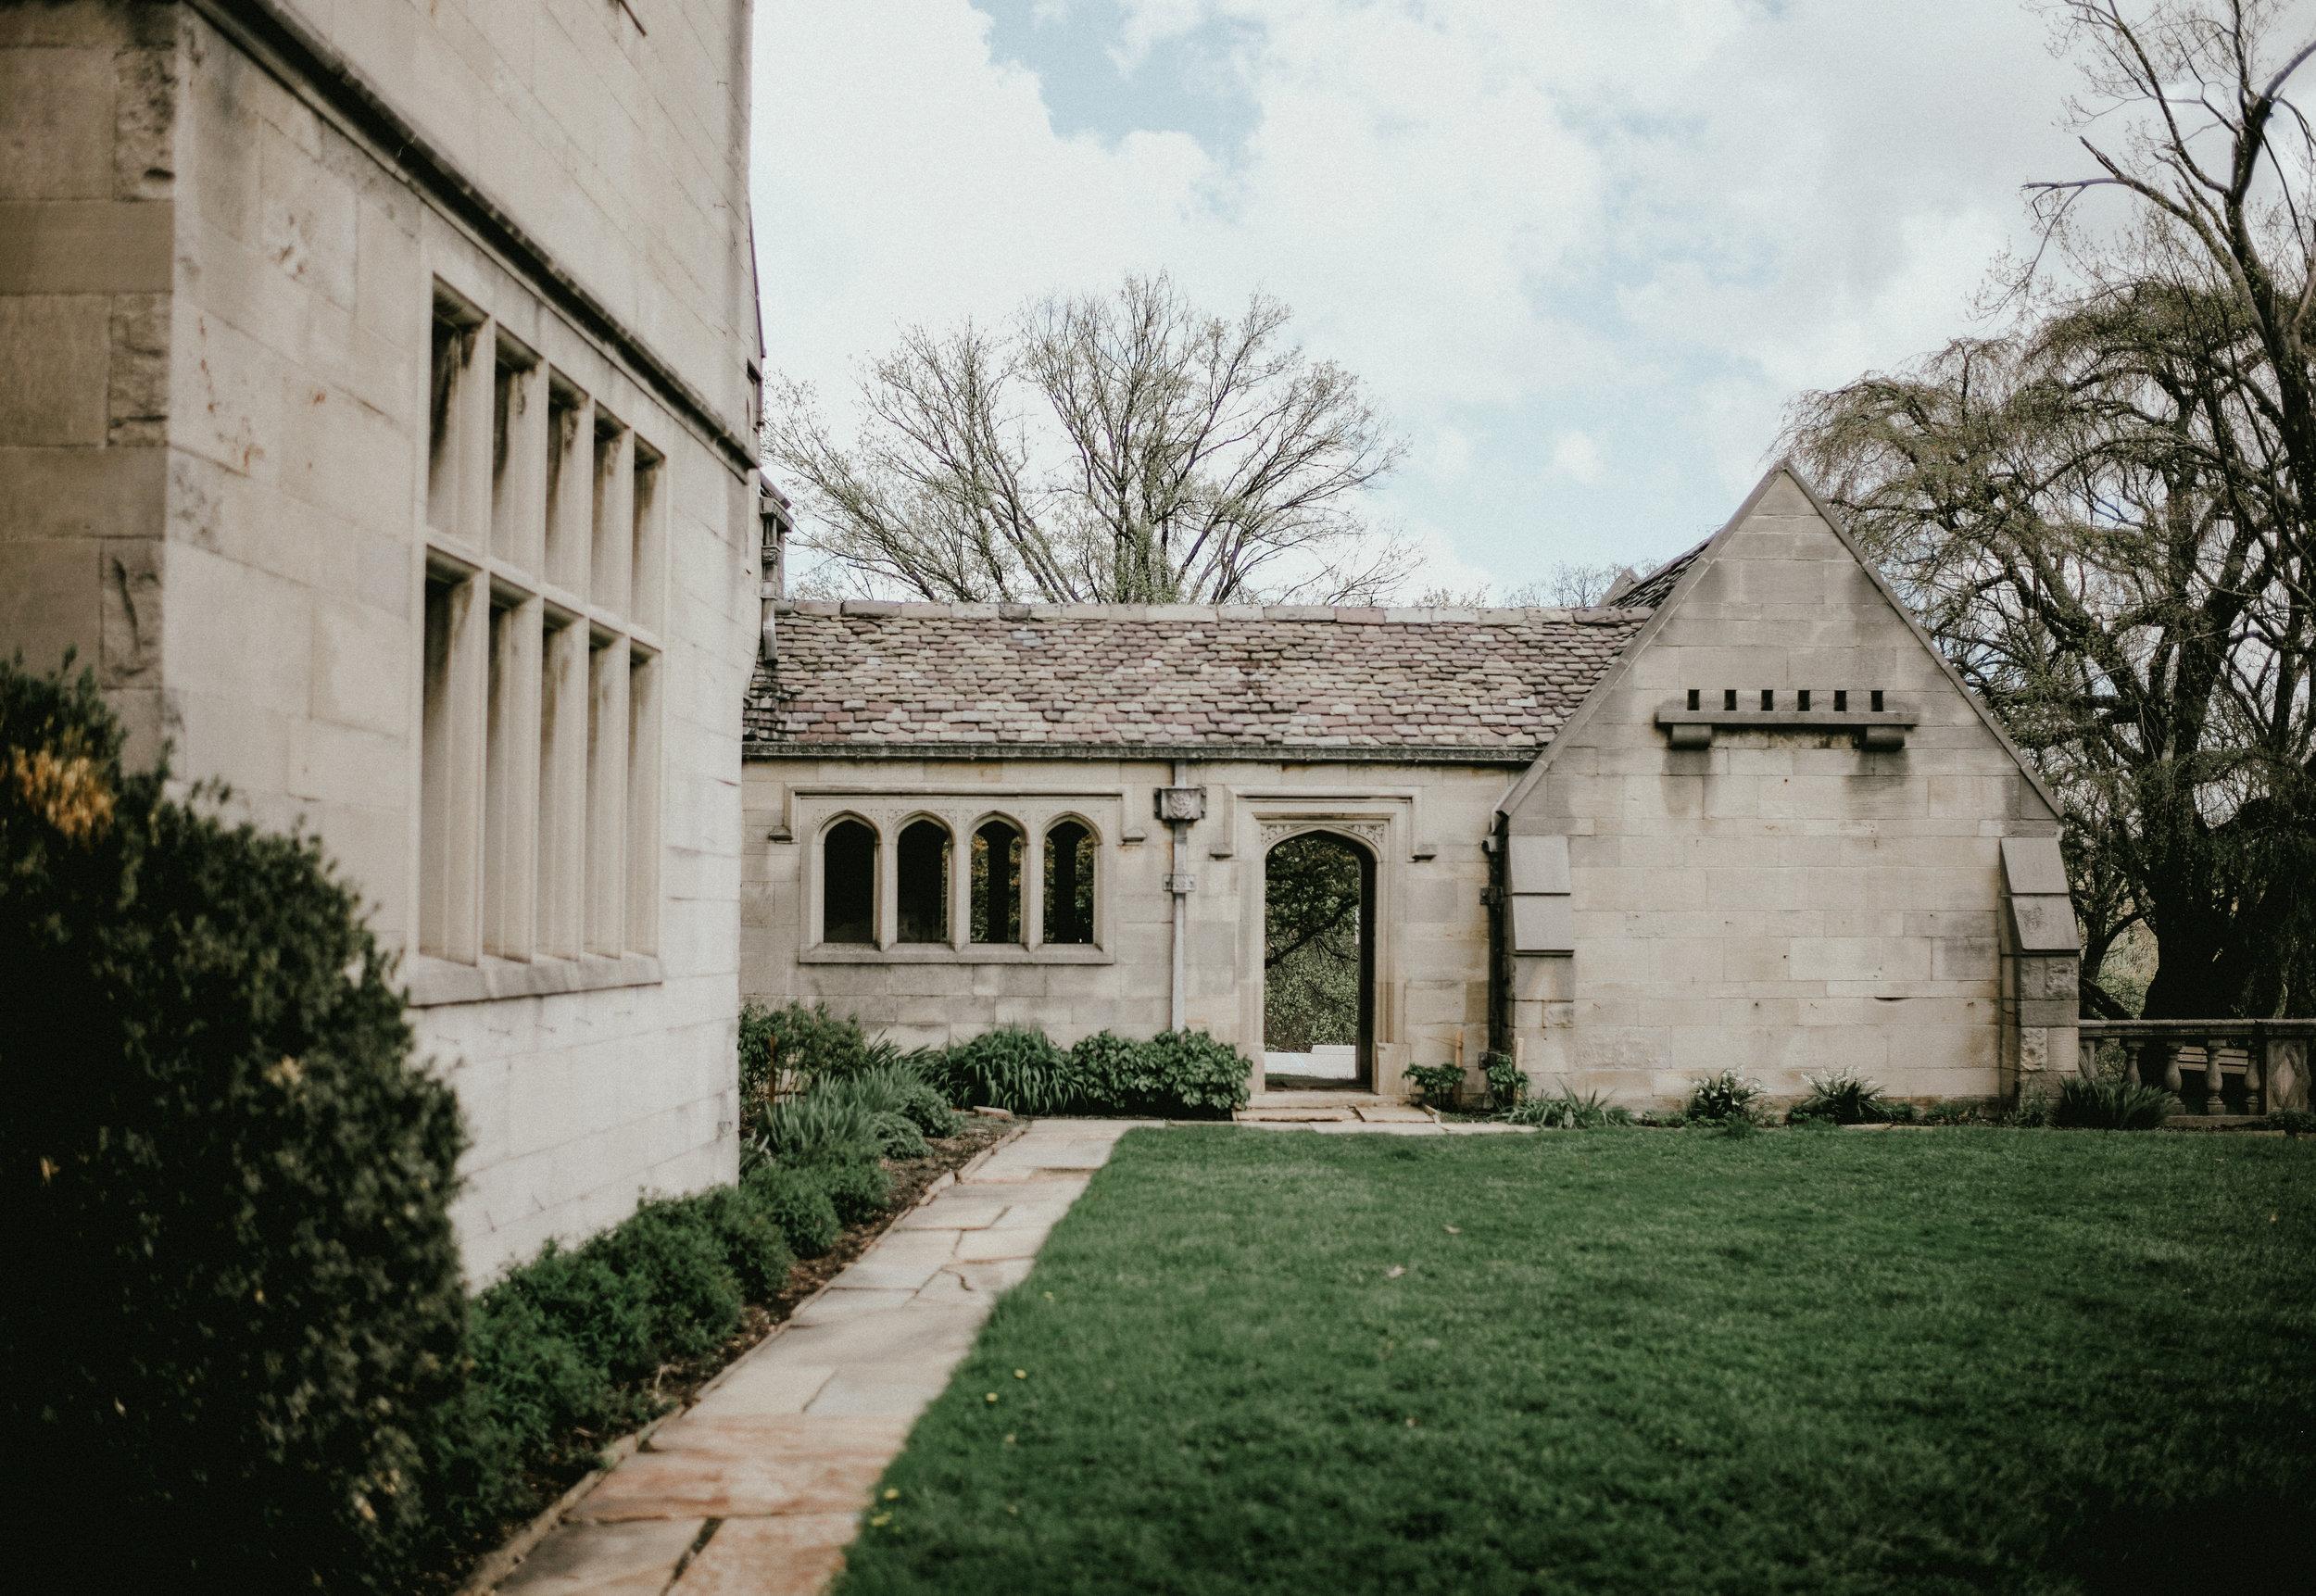 kw-hartwood-mansion-img1.jpg